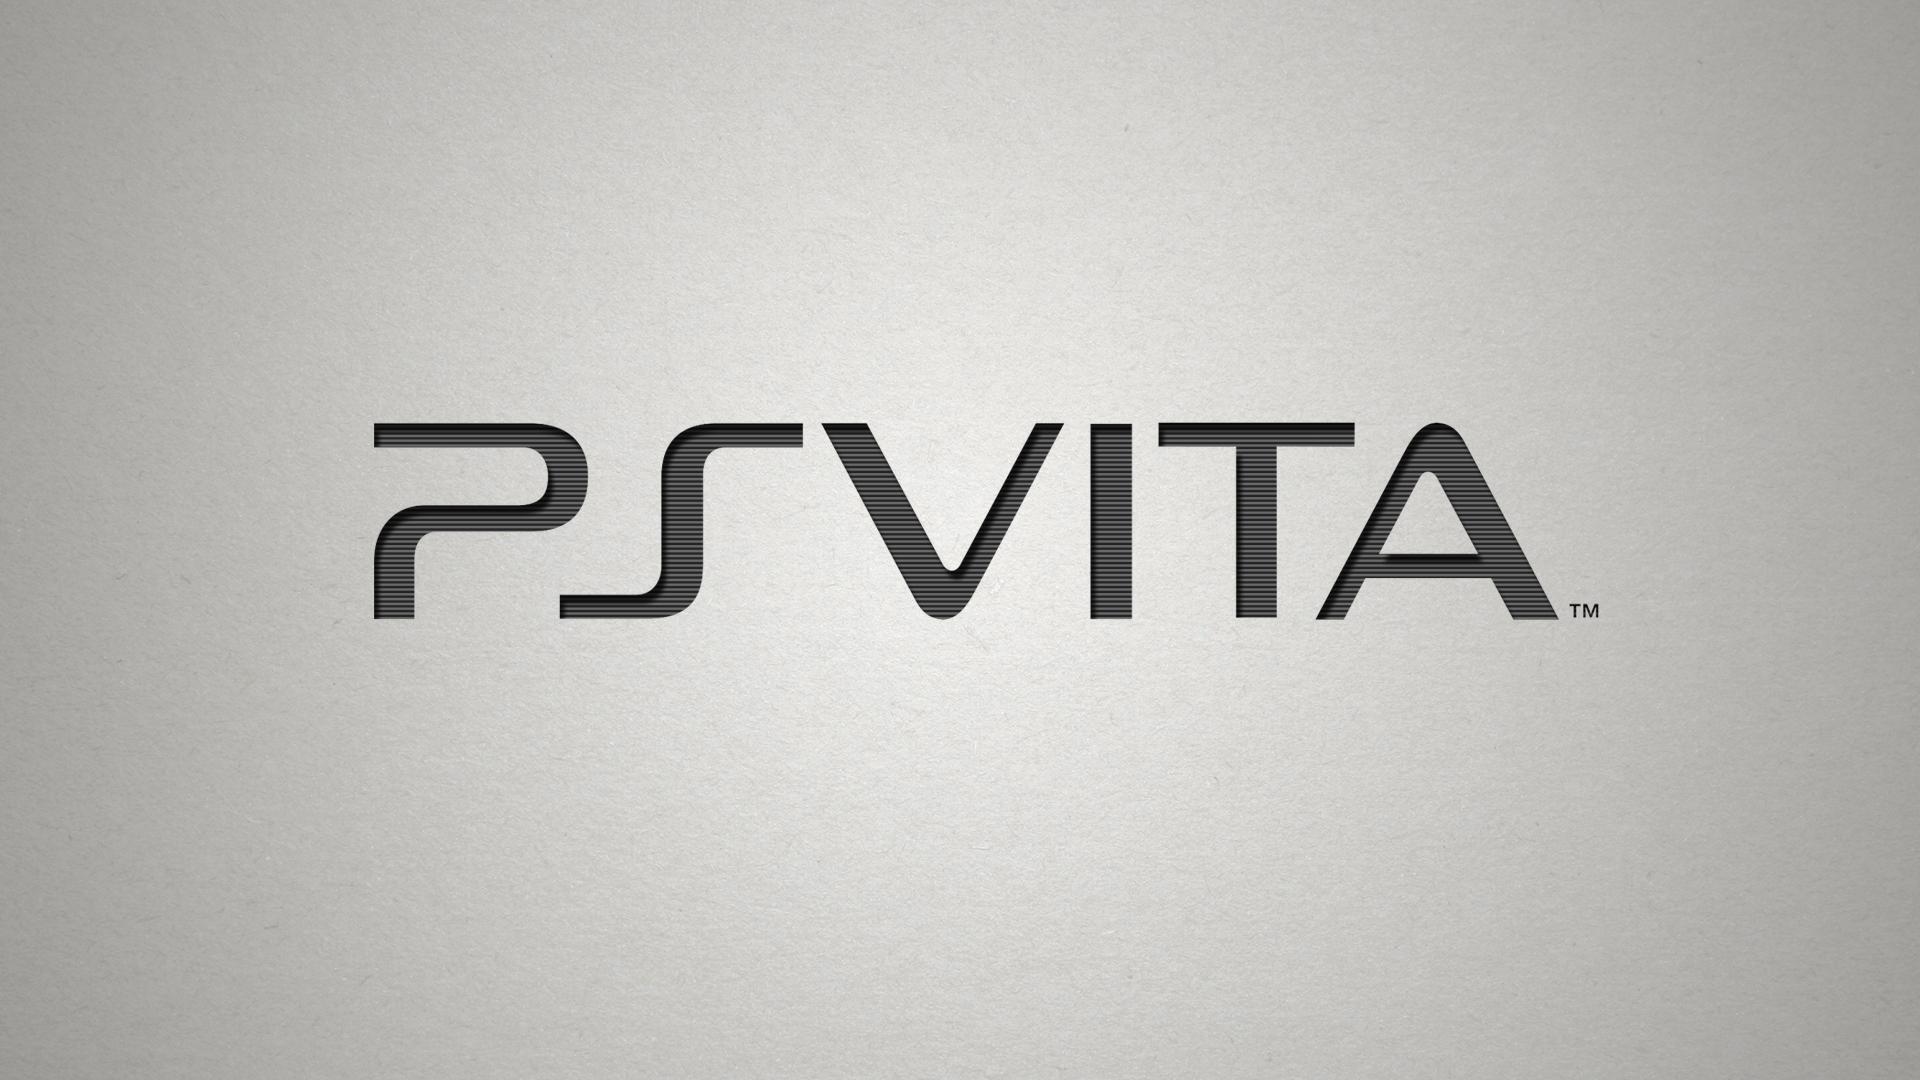 Baixa Papel De Parede Ps3: PlayStation Vita Full HD Papel De Parede And Planos De